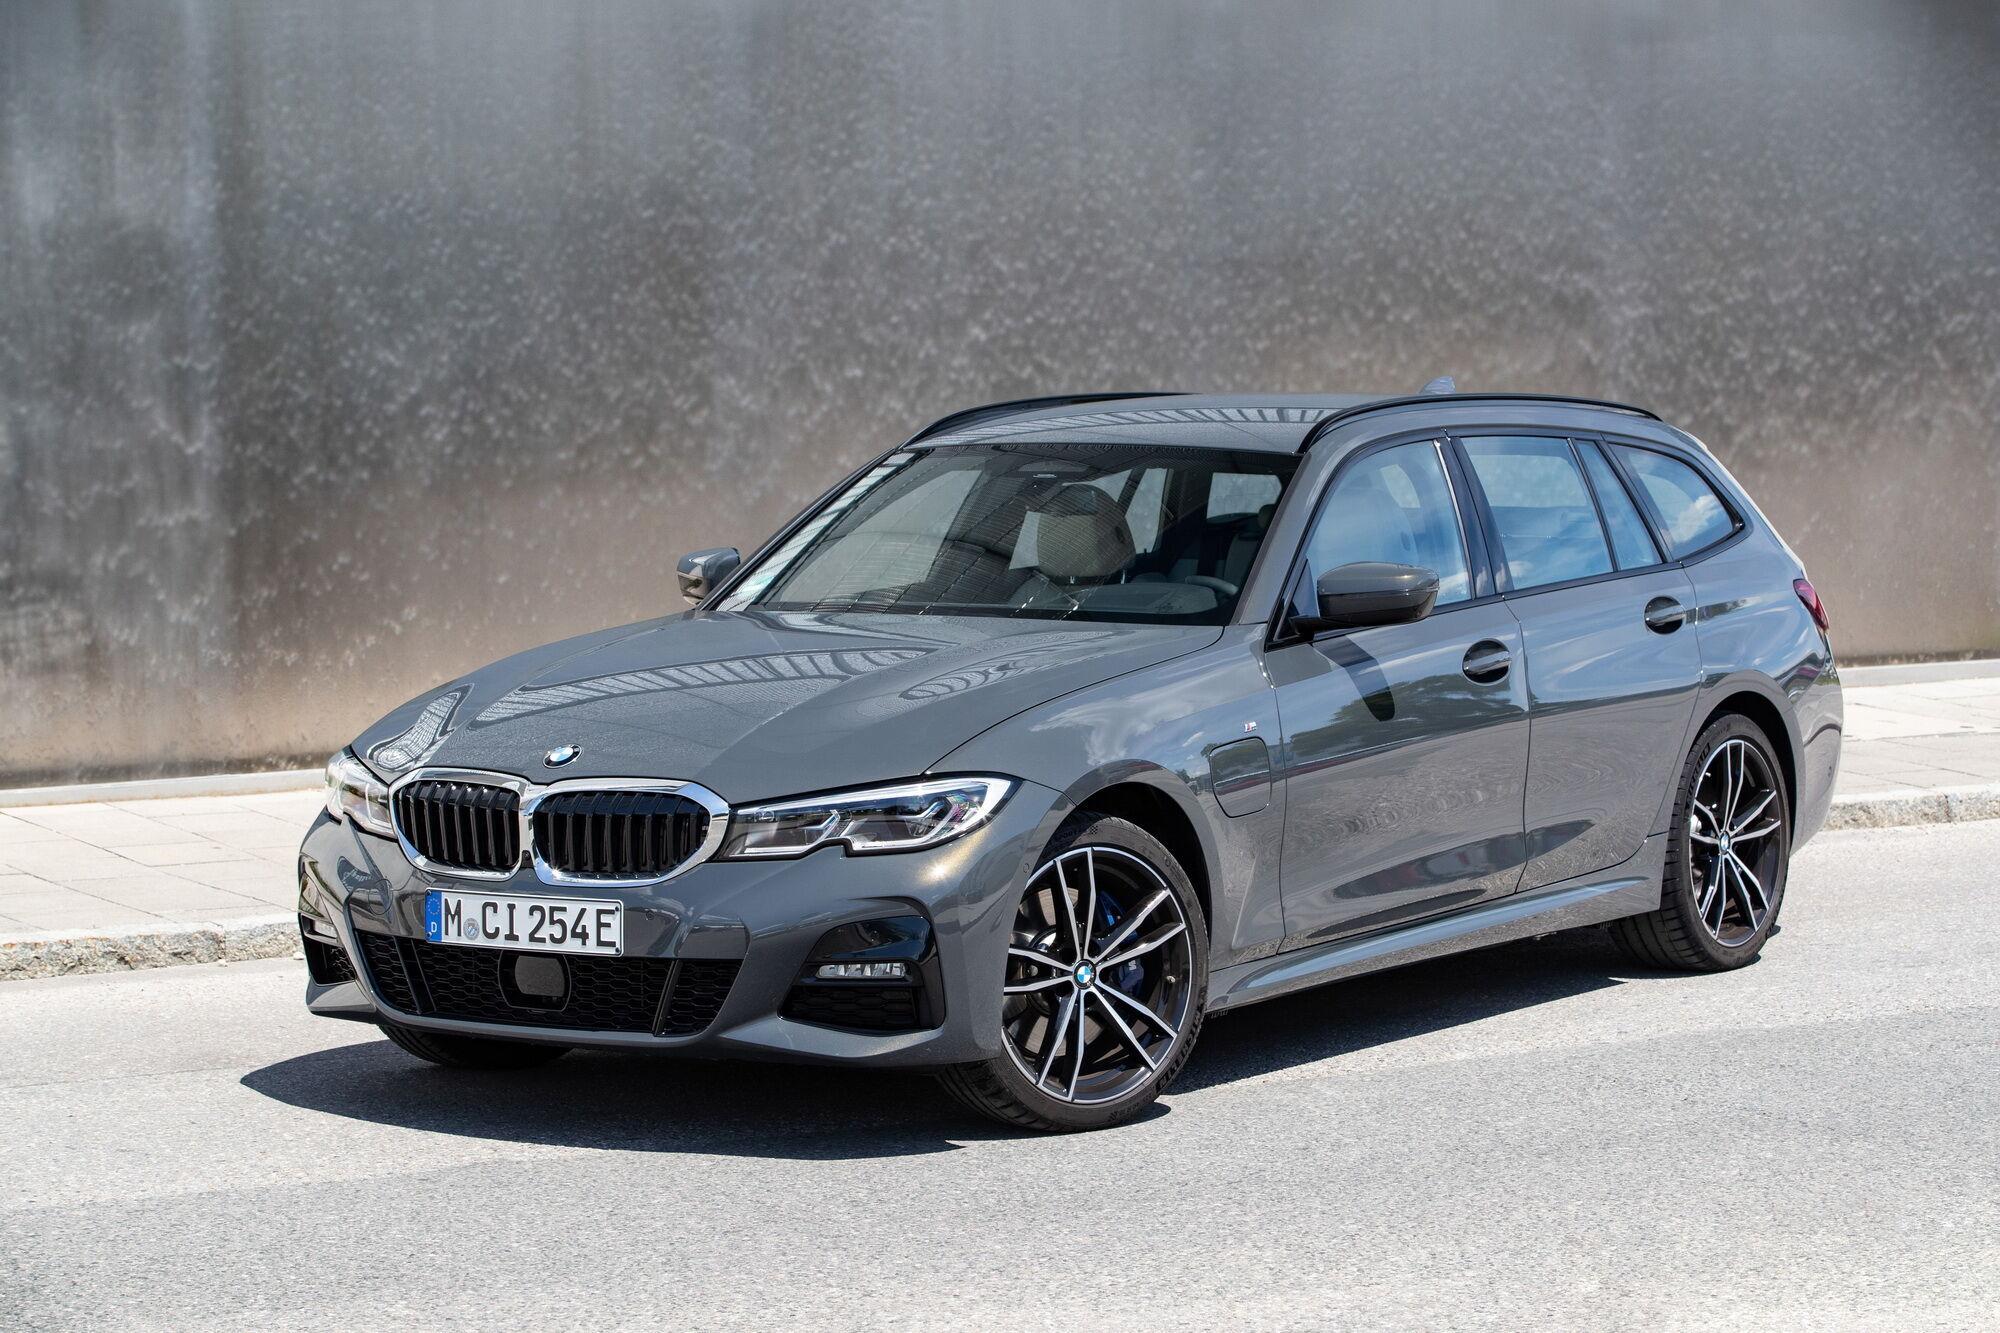 BMW 320e Touring в середньому витрачає 1,4-1,9 л на 100 км по циклу WLTP